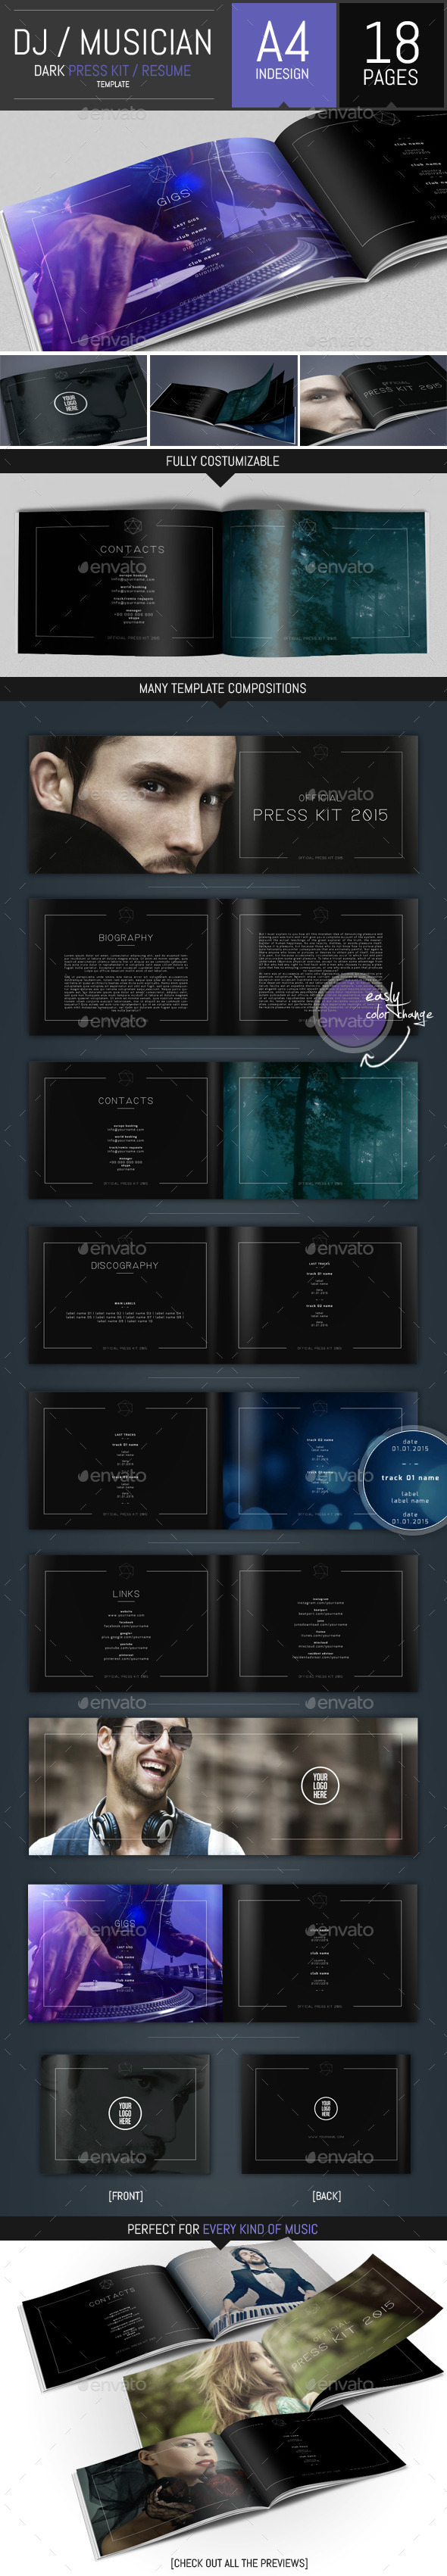 Dj and Musician Dark Press Kit / Resume Template